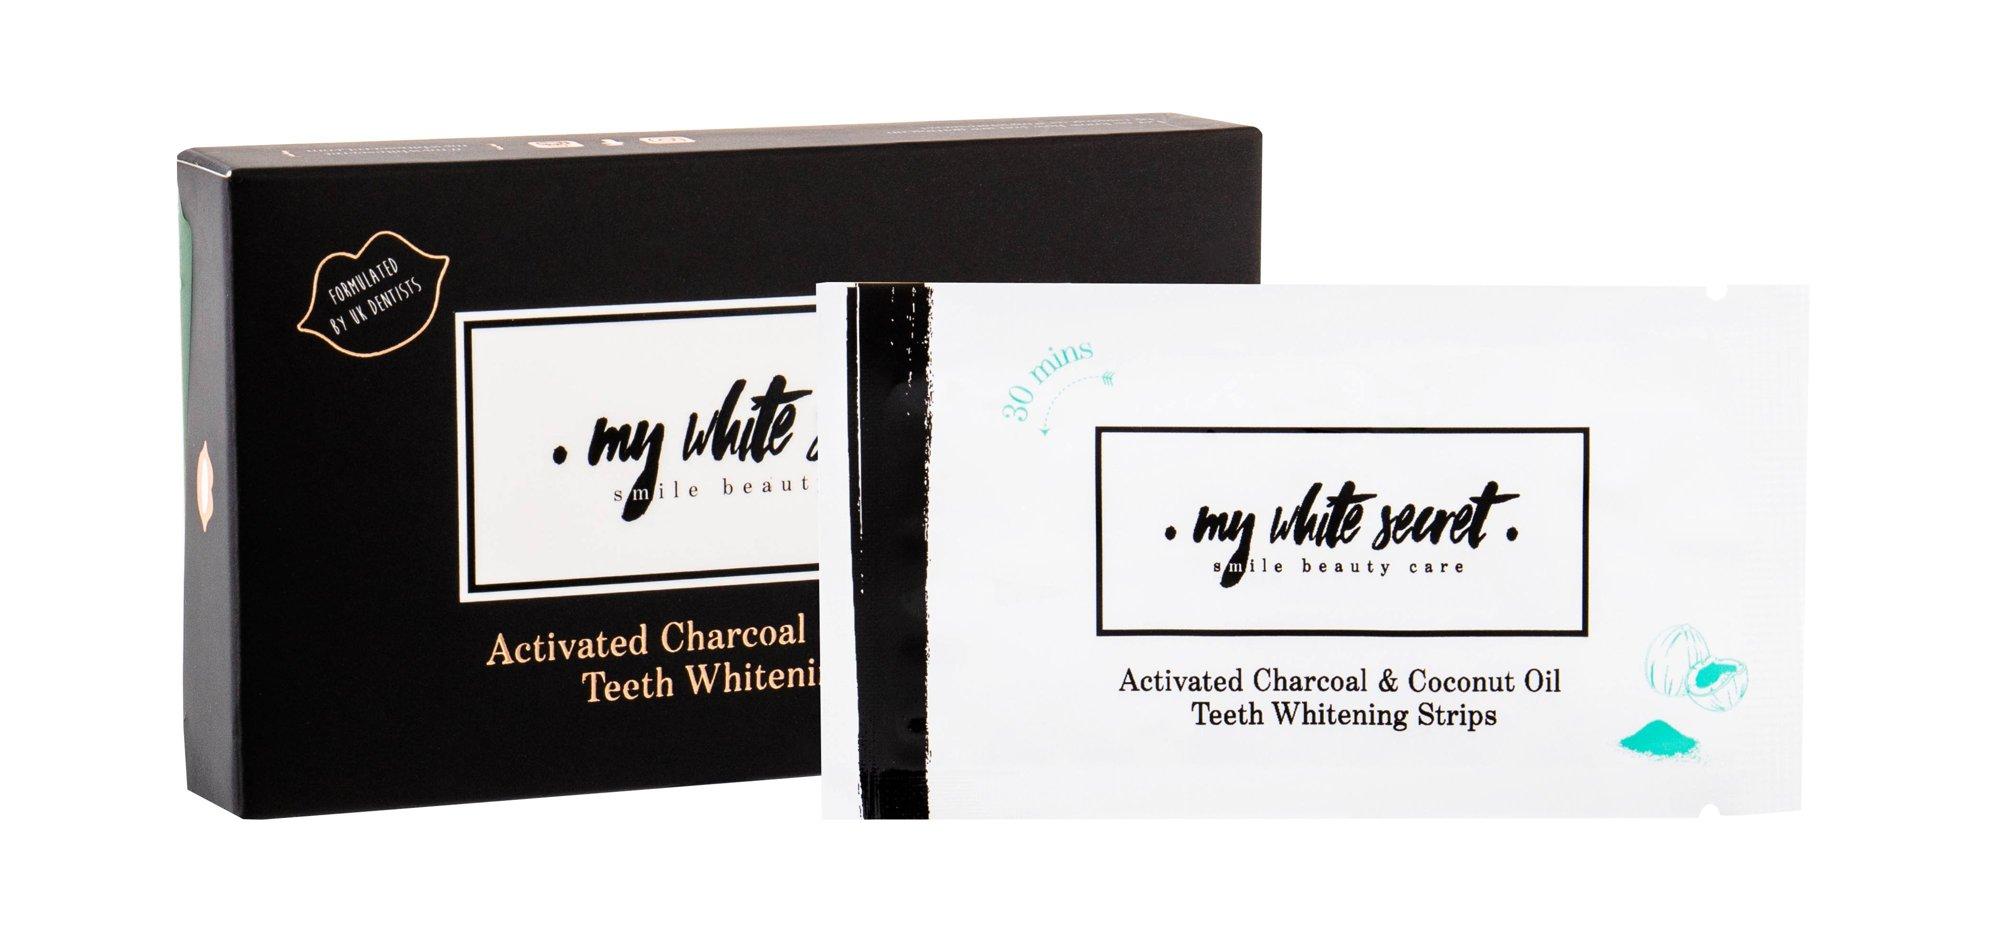 My White Secret Teeth Whitening Strips Teeth Whitening 14ml